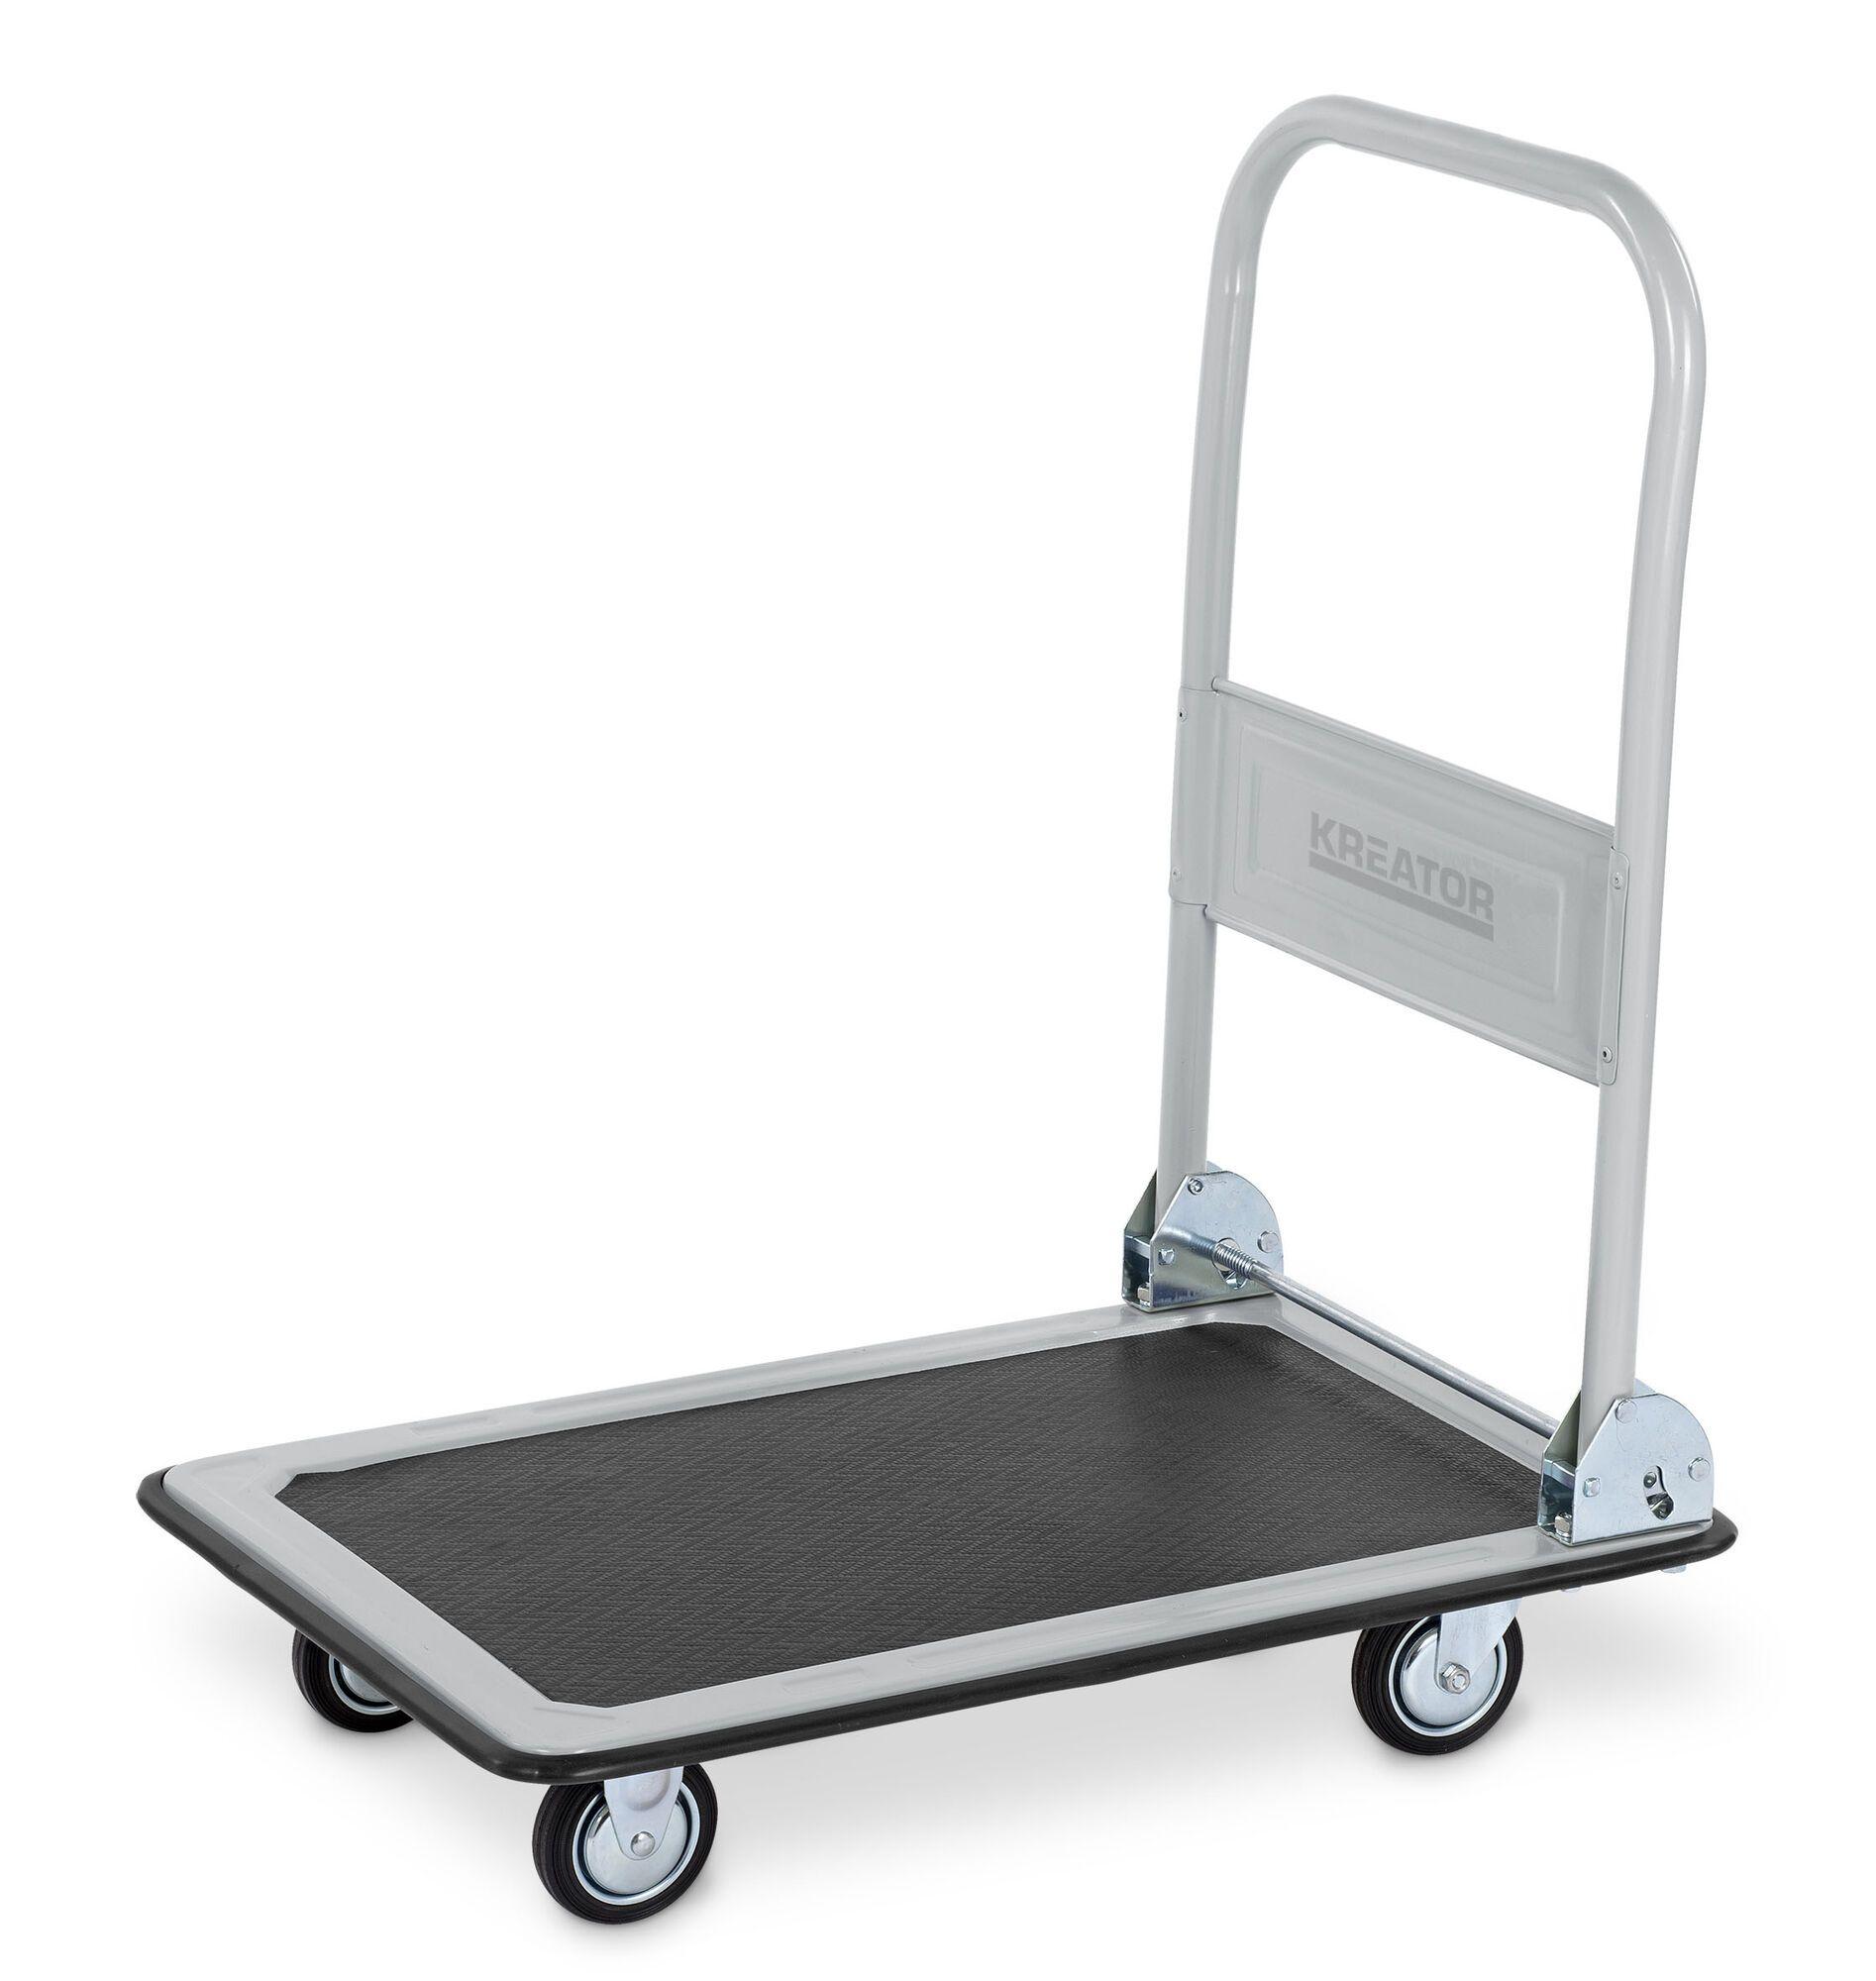 Kreator KRT670101 Vouwbare magazijnwagen 150kg | Plateauwagen